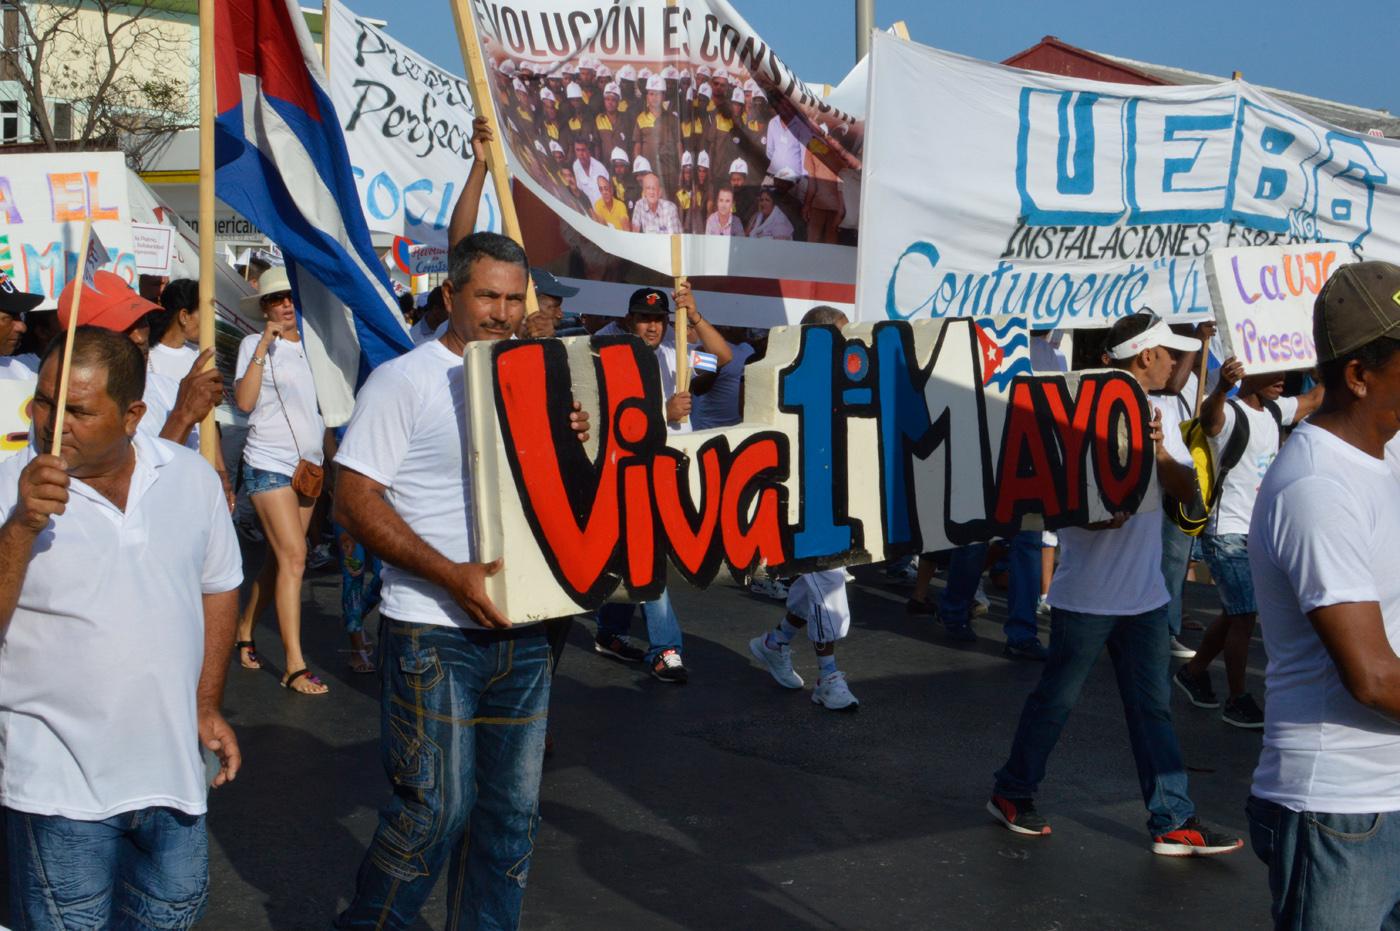 Varadero-May-Workers-Day-parade-Viva.jpg